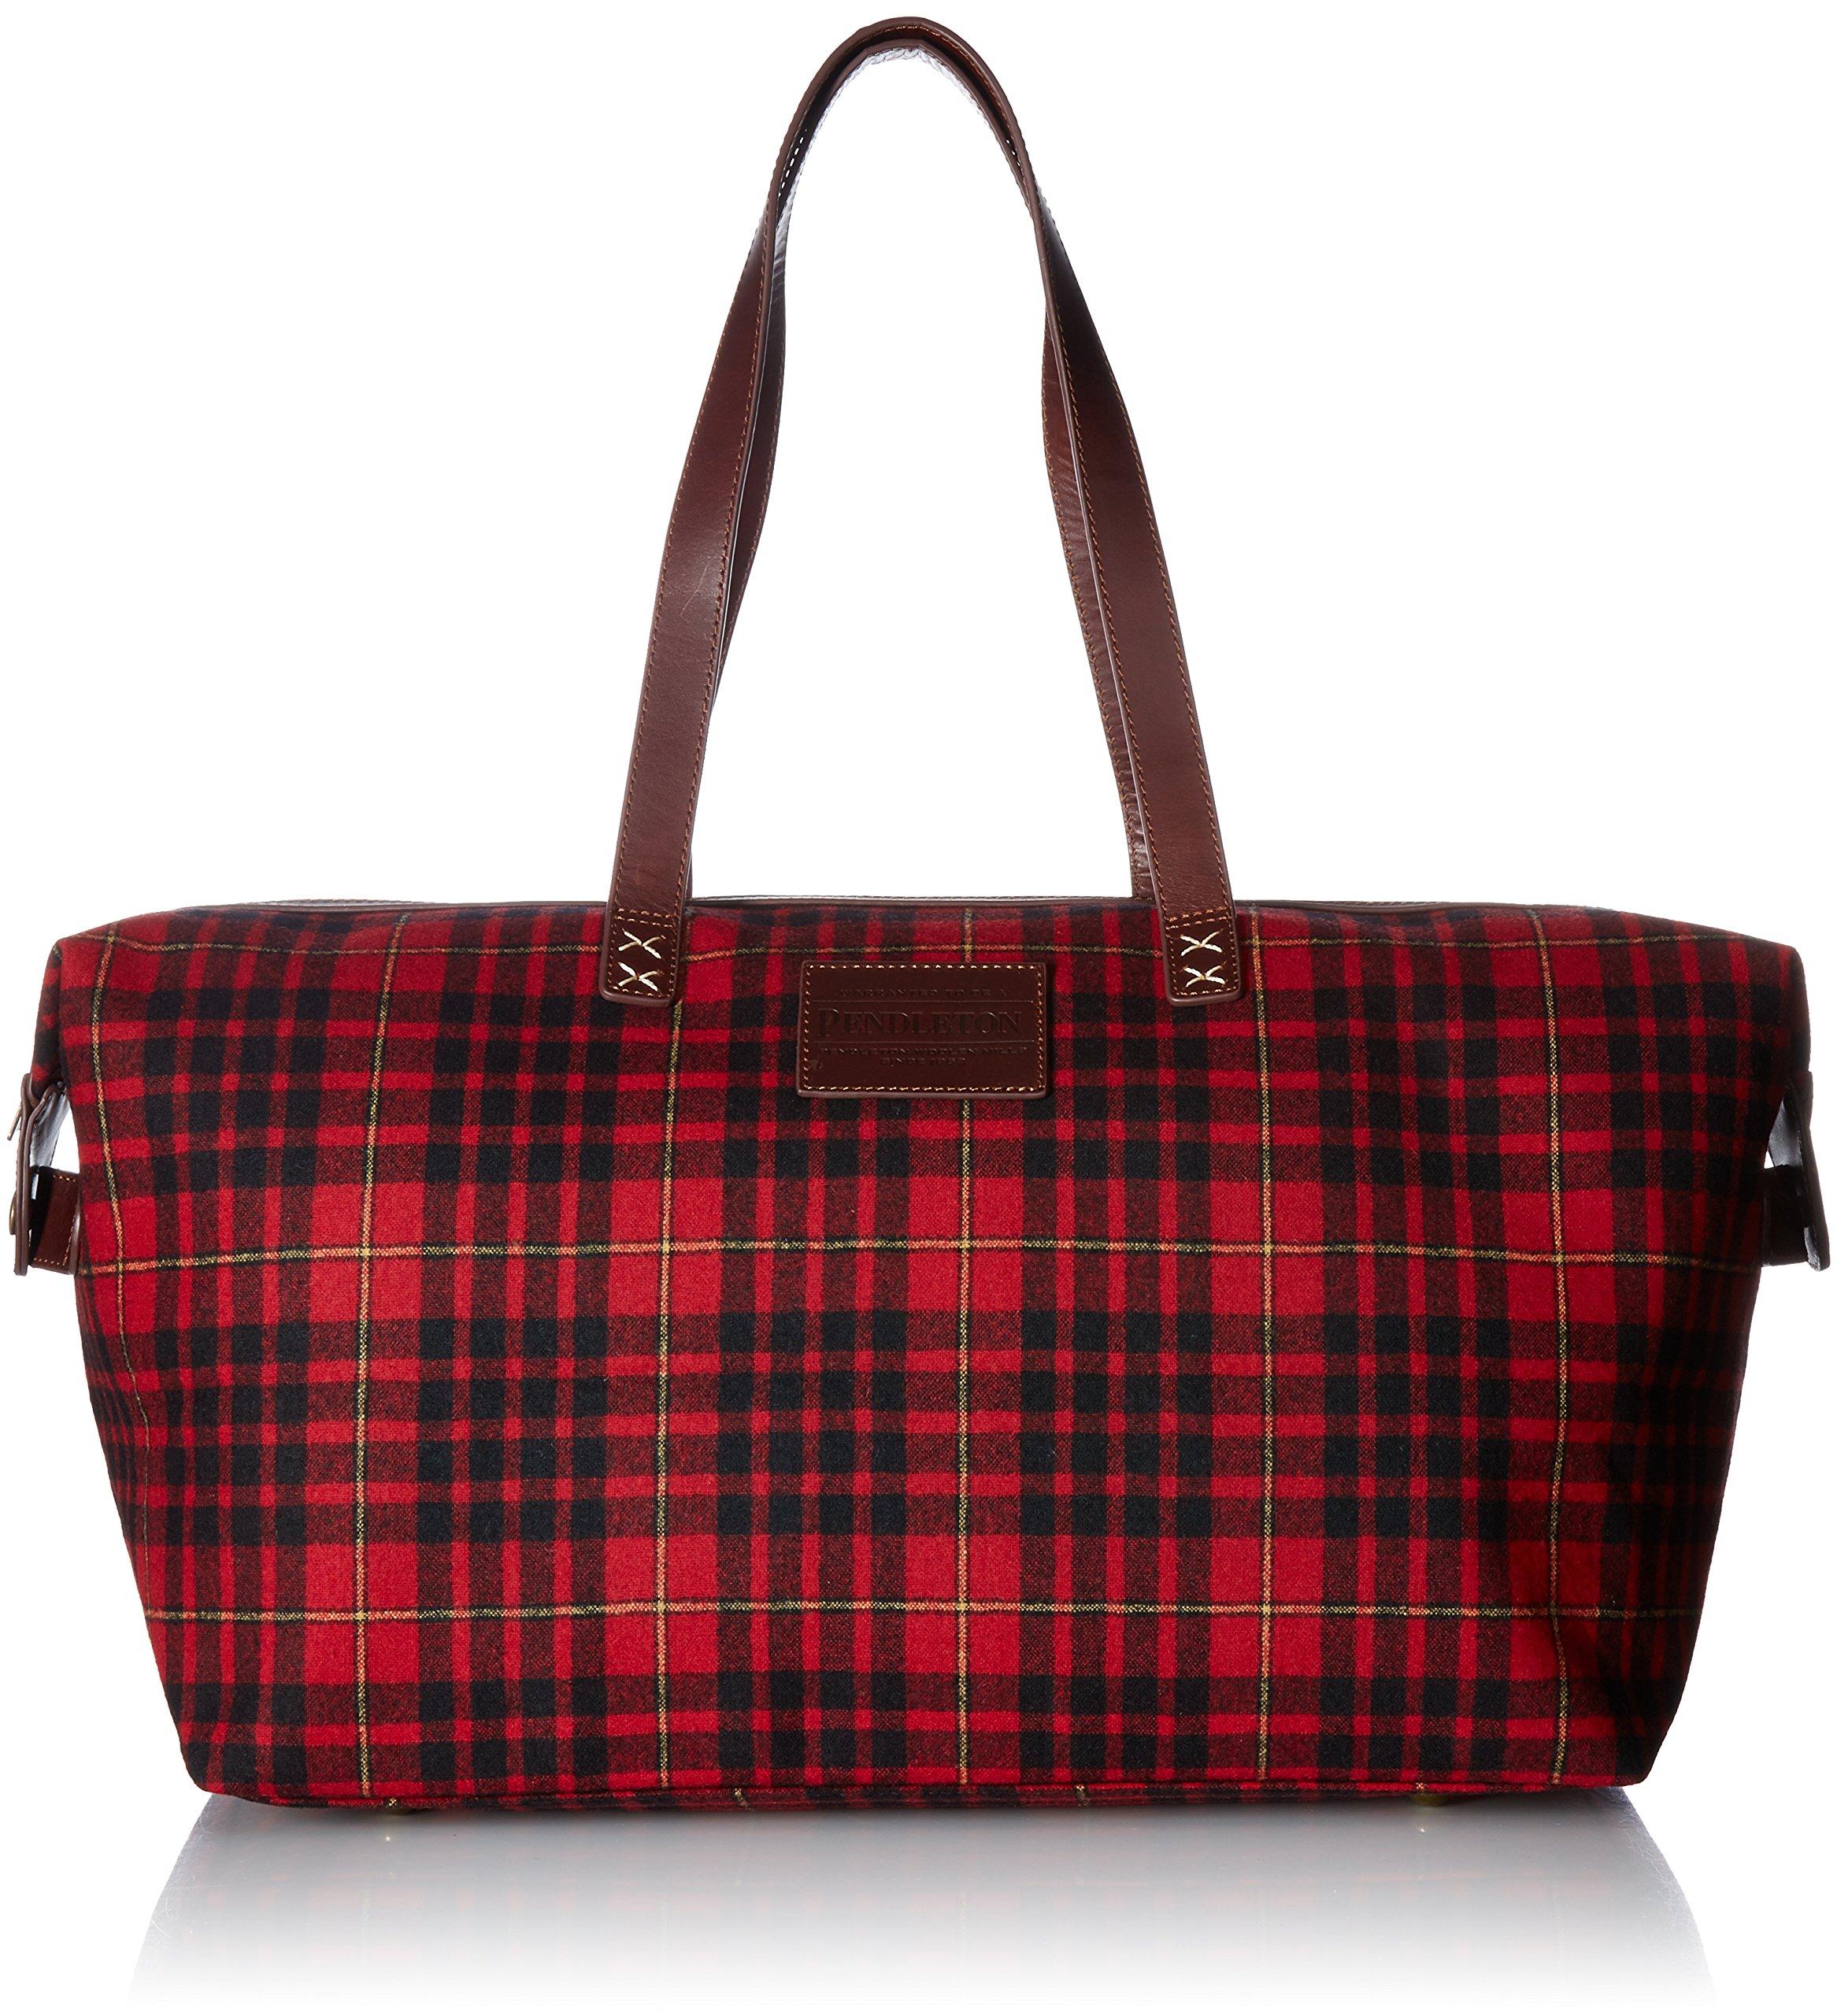 Pendleton Women's Relaxed Gym Bag Accessory, -MacIan Tartan, One Size